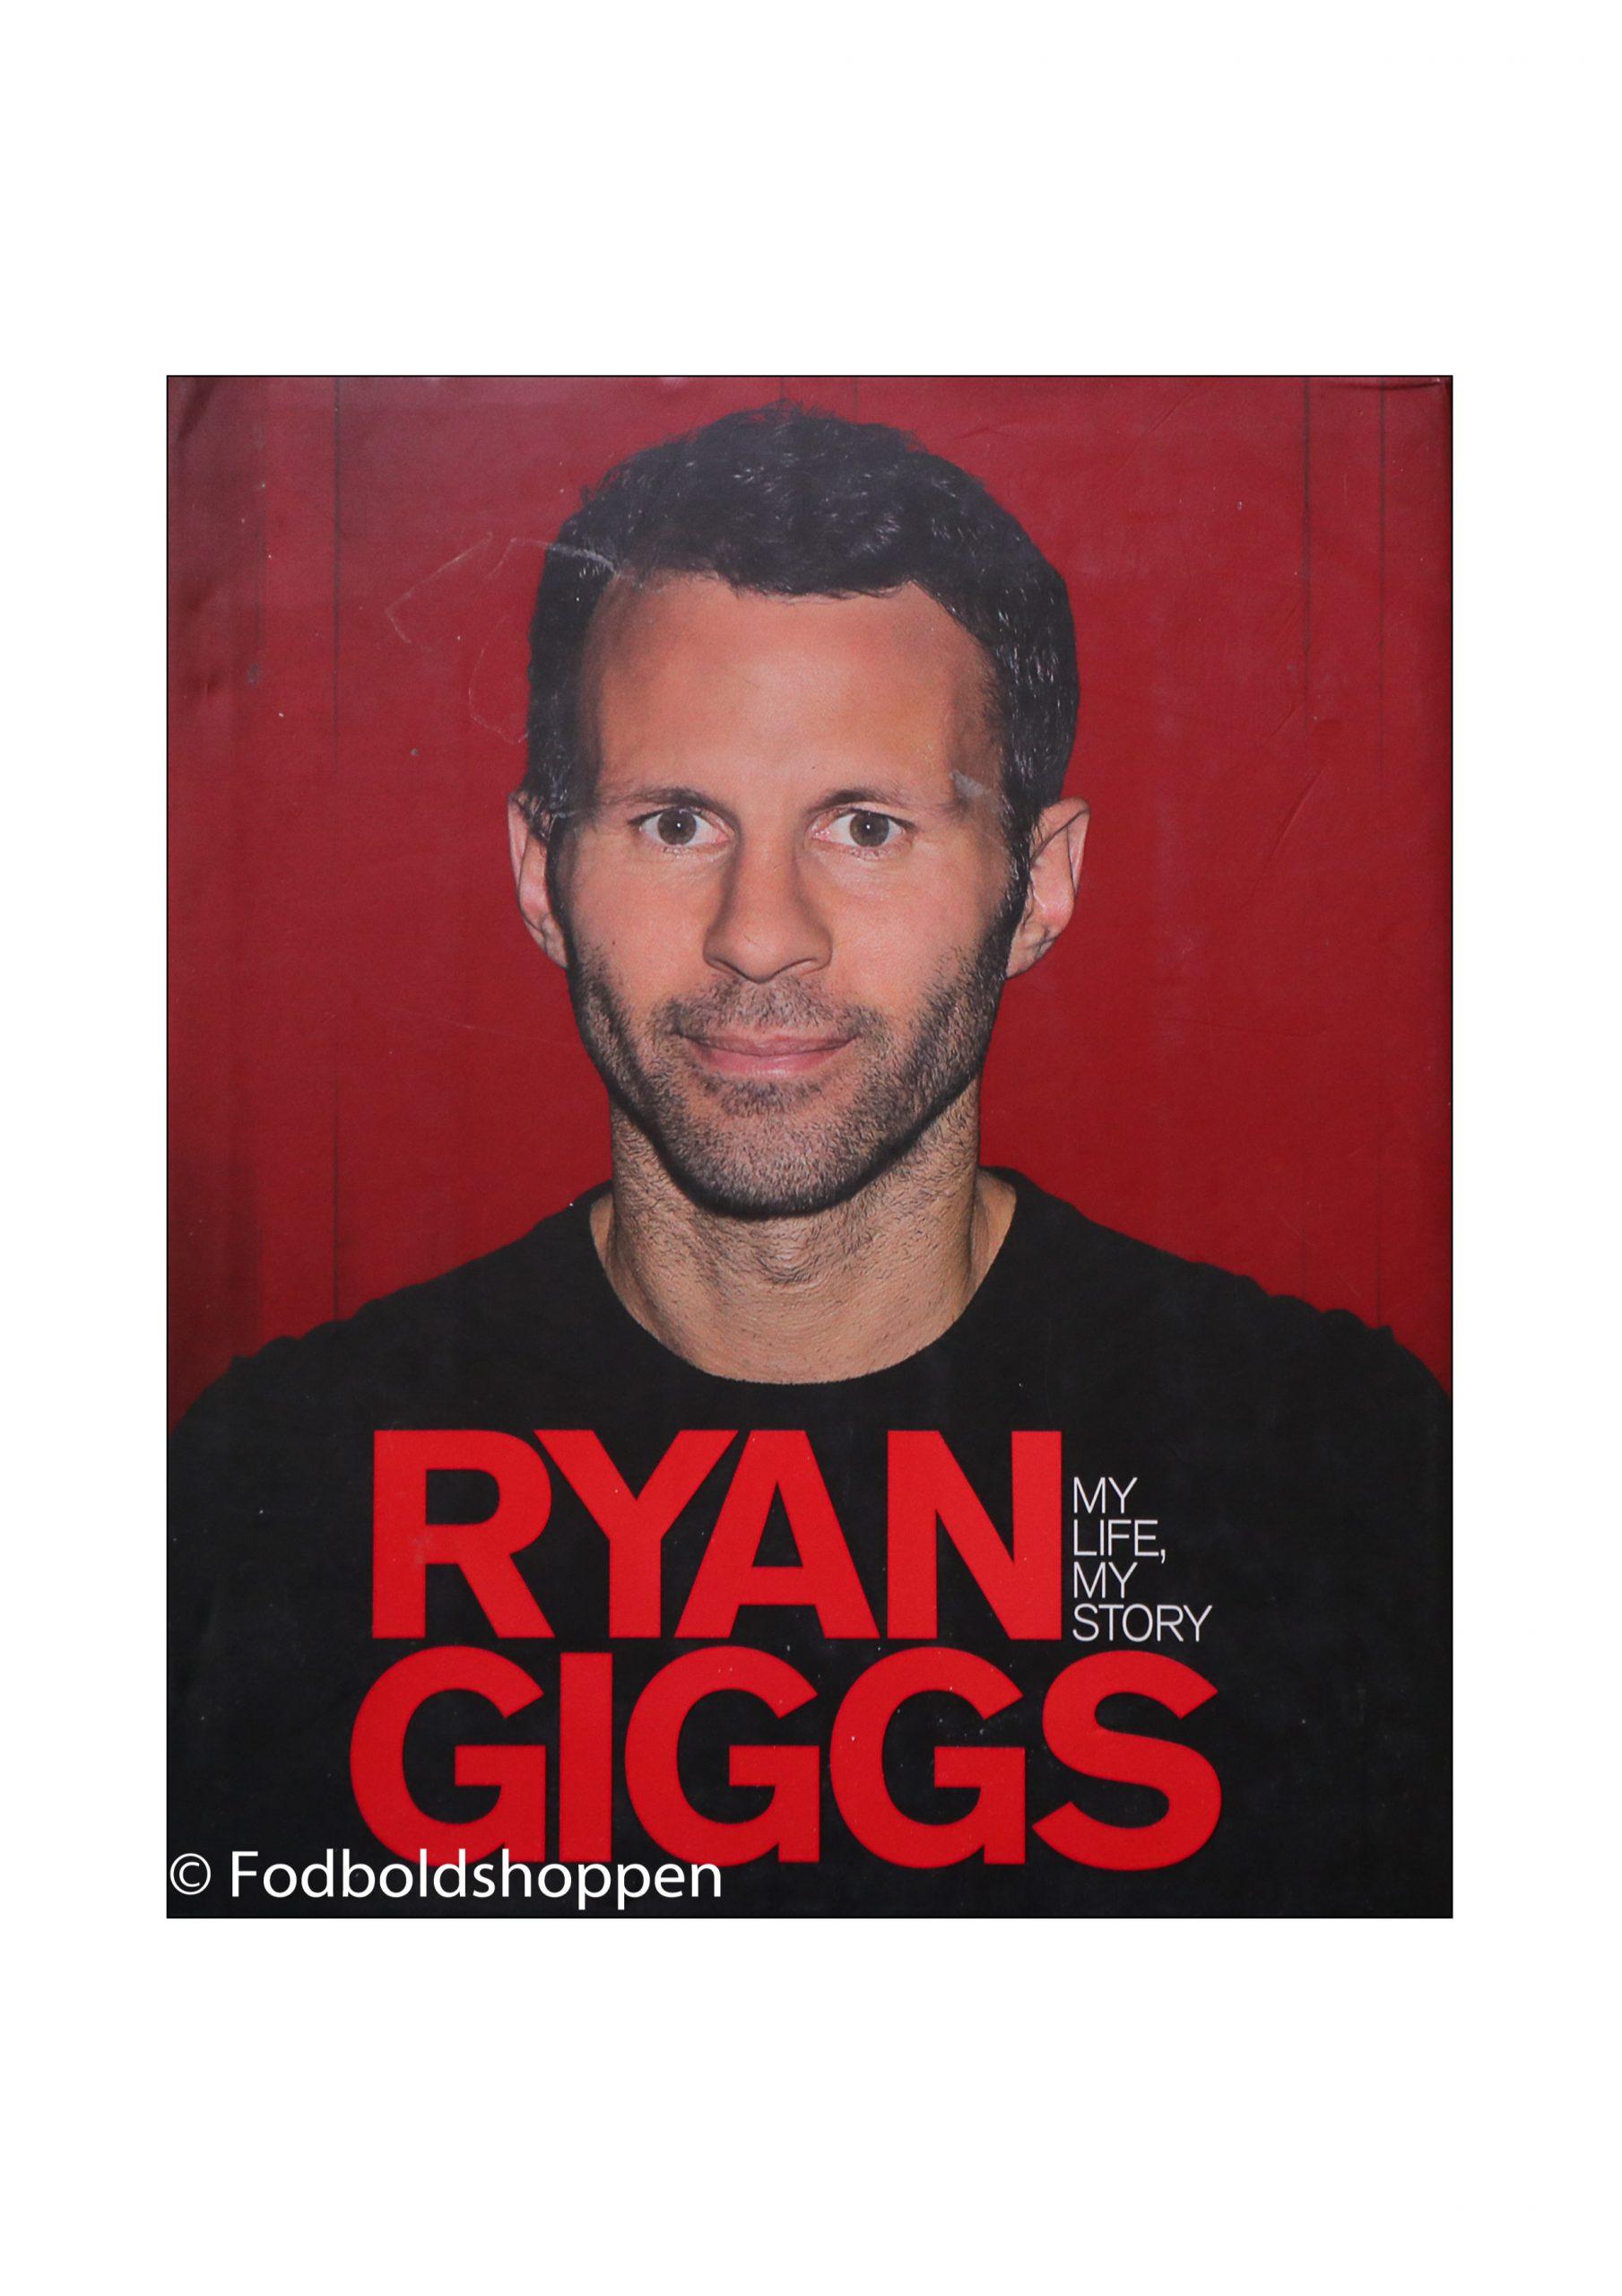 Ryan Giggs - My life, my story